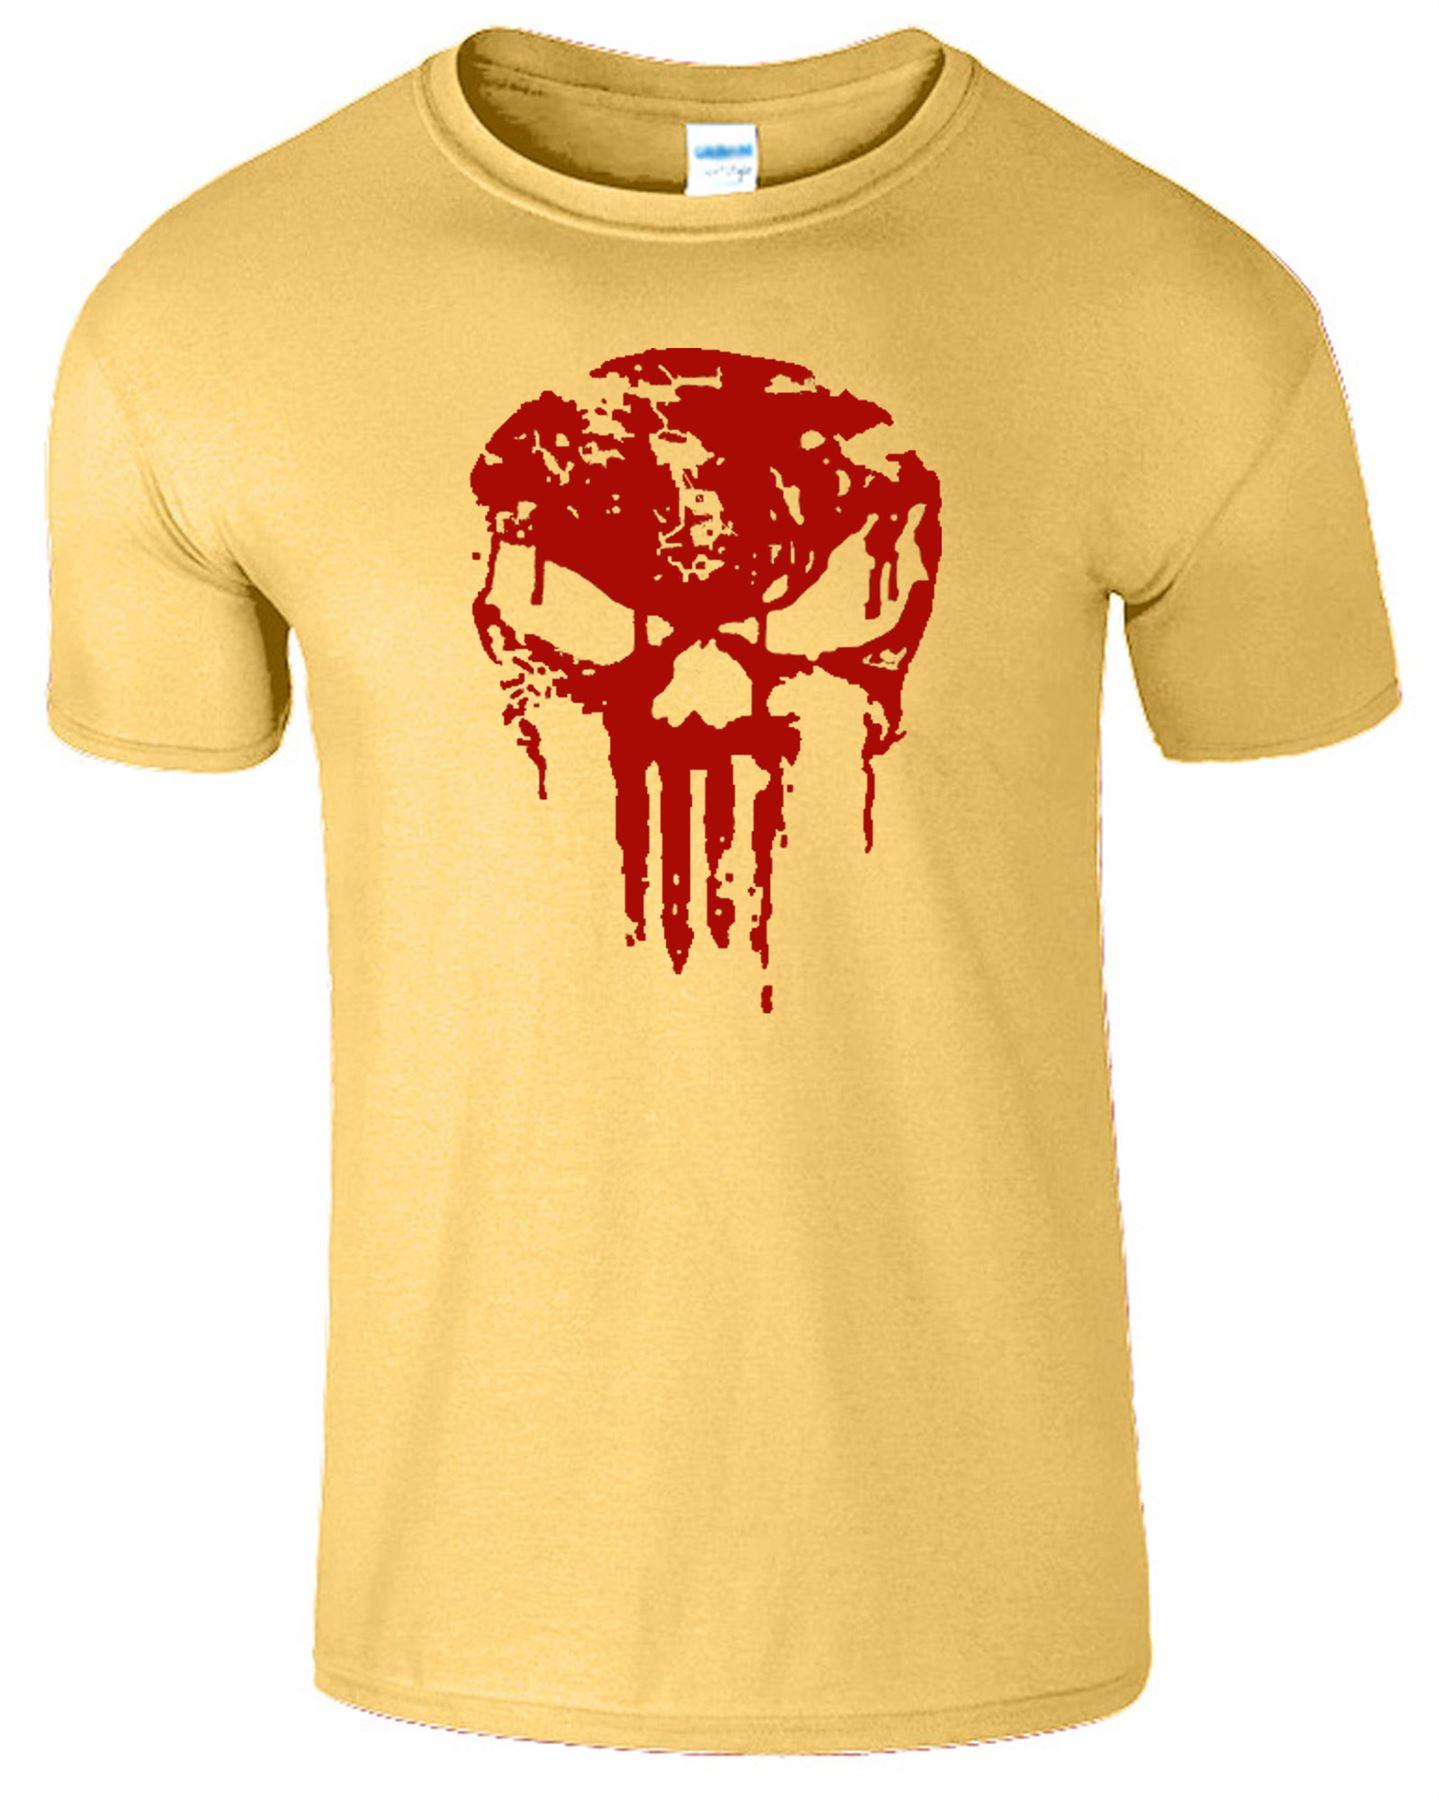 Punisher Skull Bloody Mens Frank Castle Red Logo Crossfit Gym Workout Top TShirt